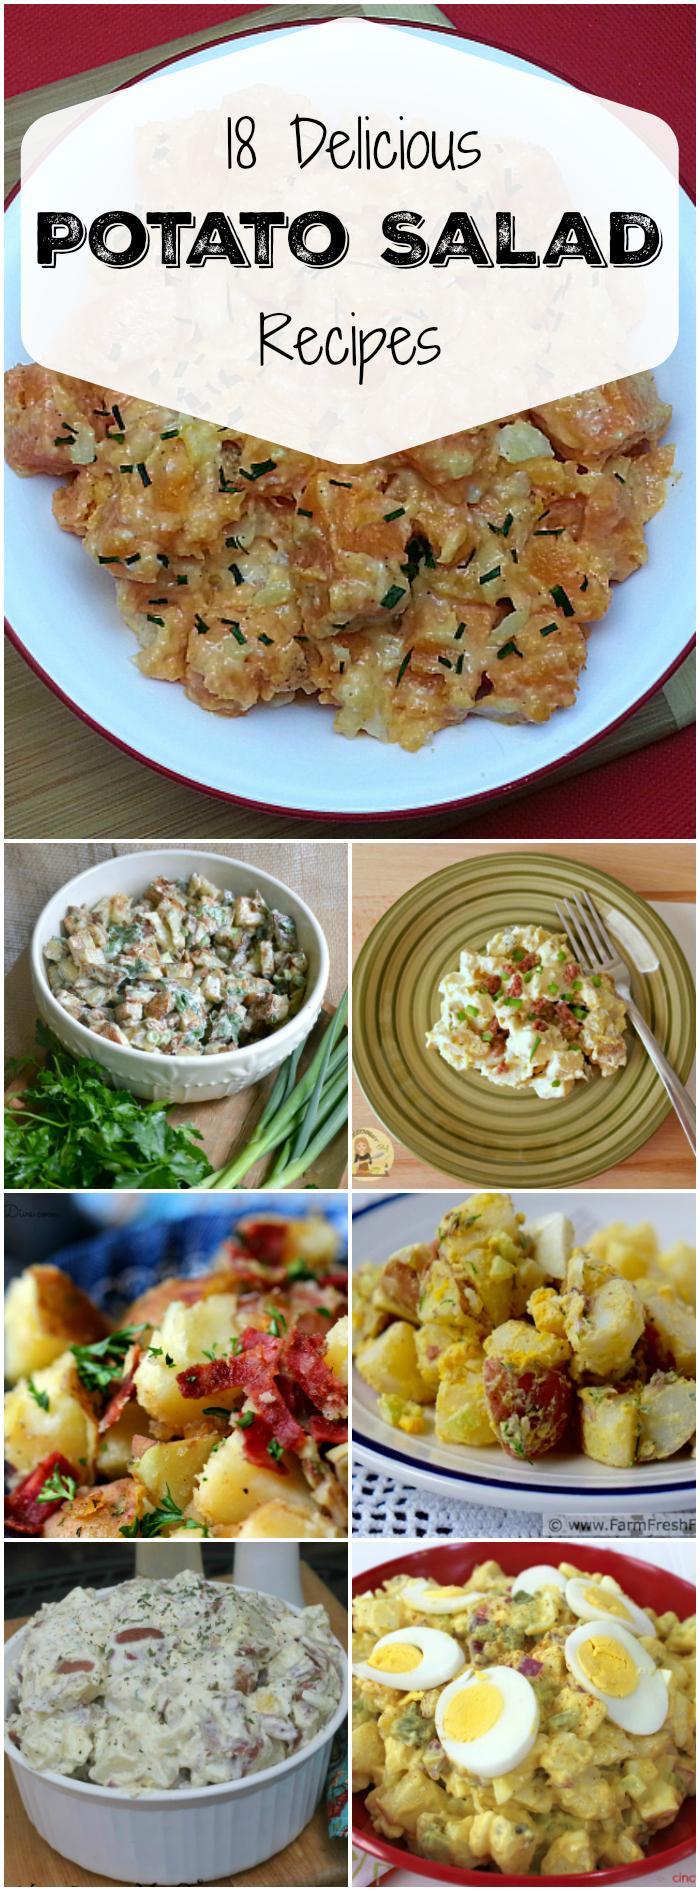 18 Delicious Potato Salad Recipes